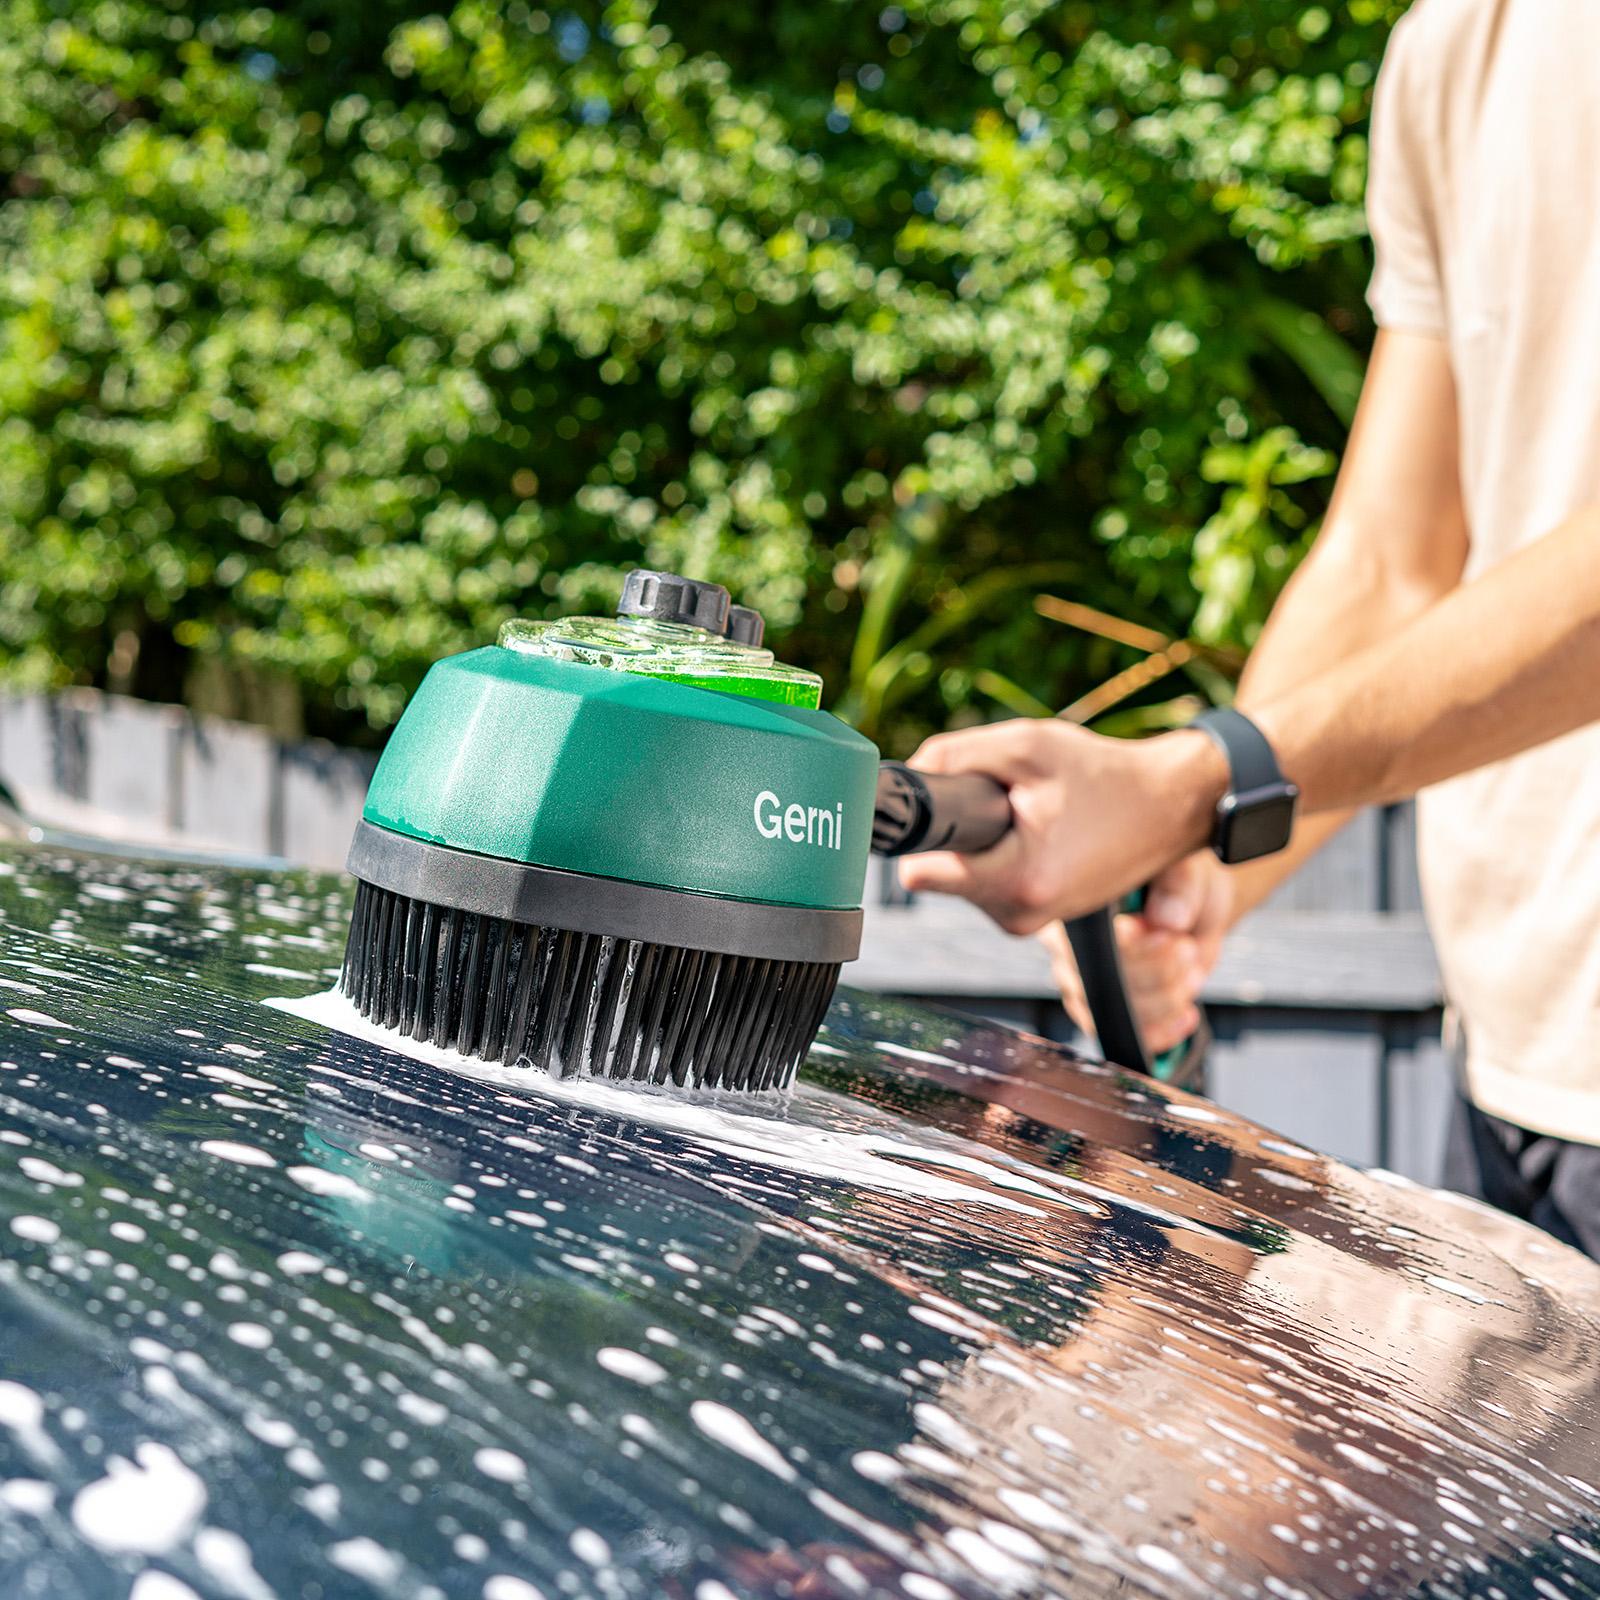 Gerni Rotary Detergent Brush - Car Hood